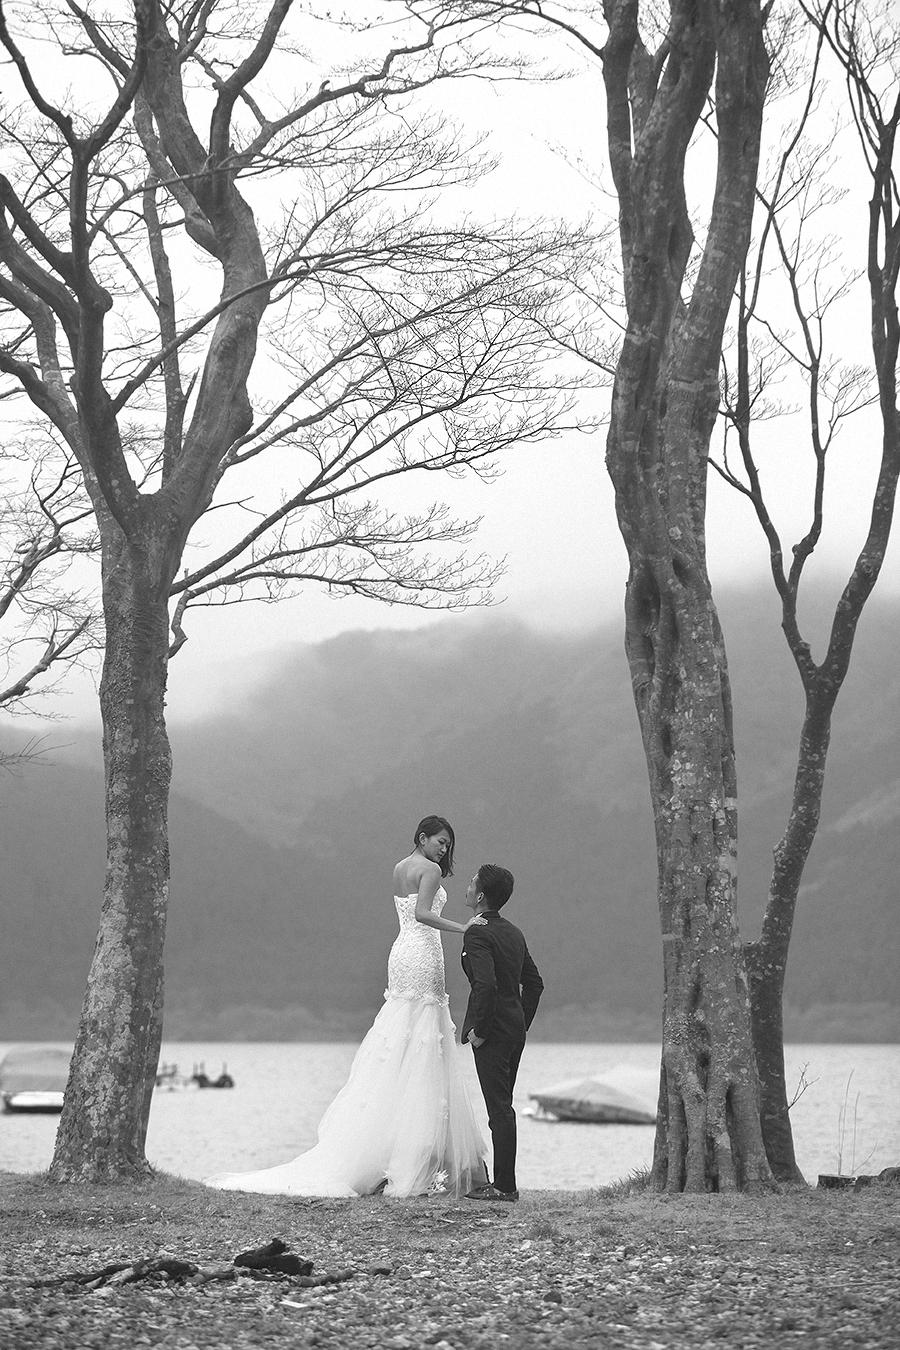 tokyo hakone japan spring sakura . engagement wedding photography by kurt ahs . ns + eu . 0379.jpg